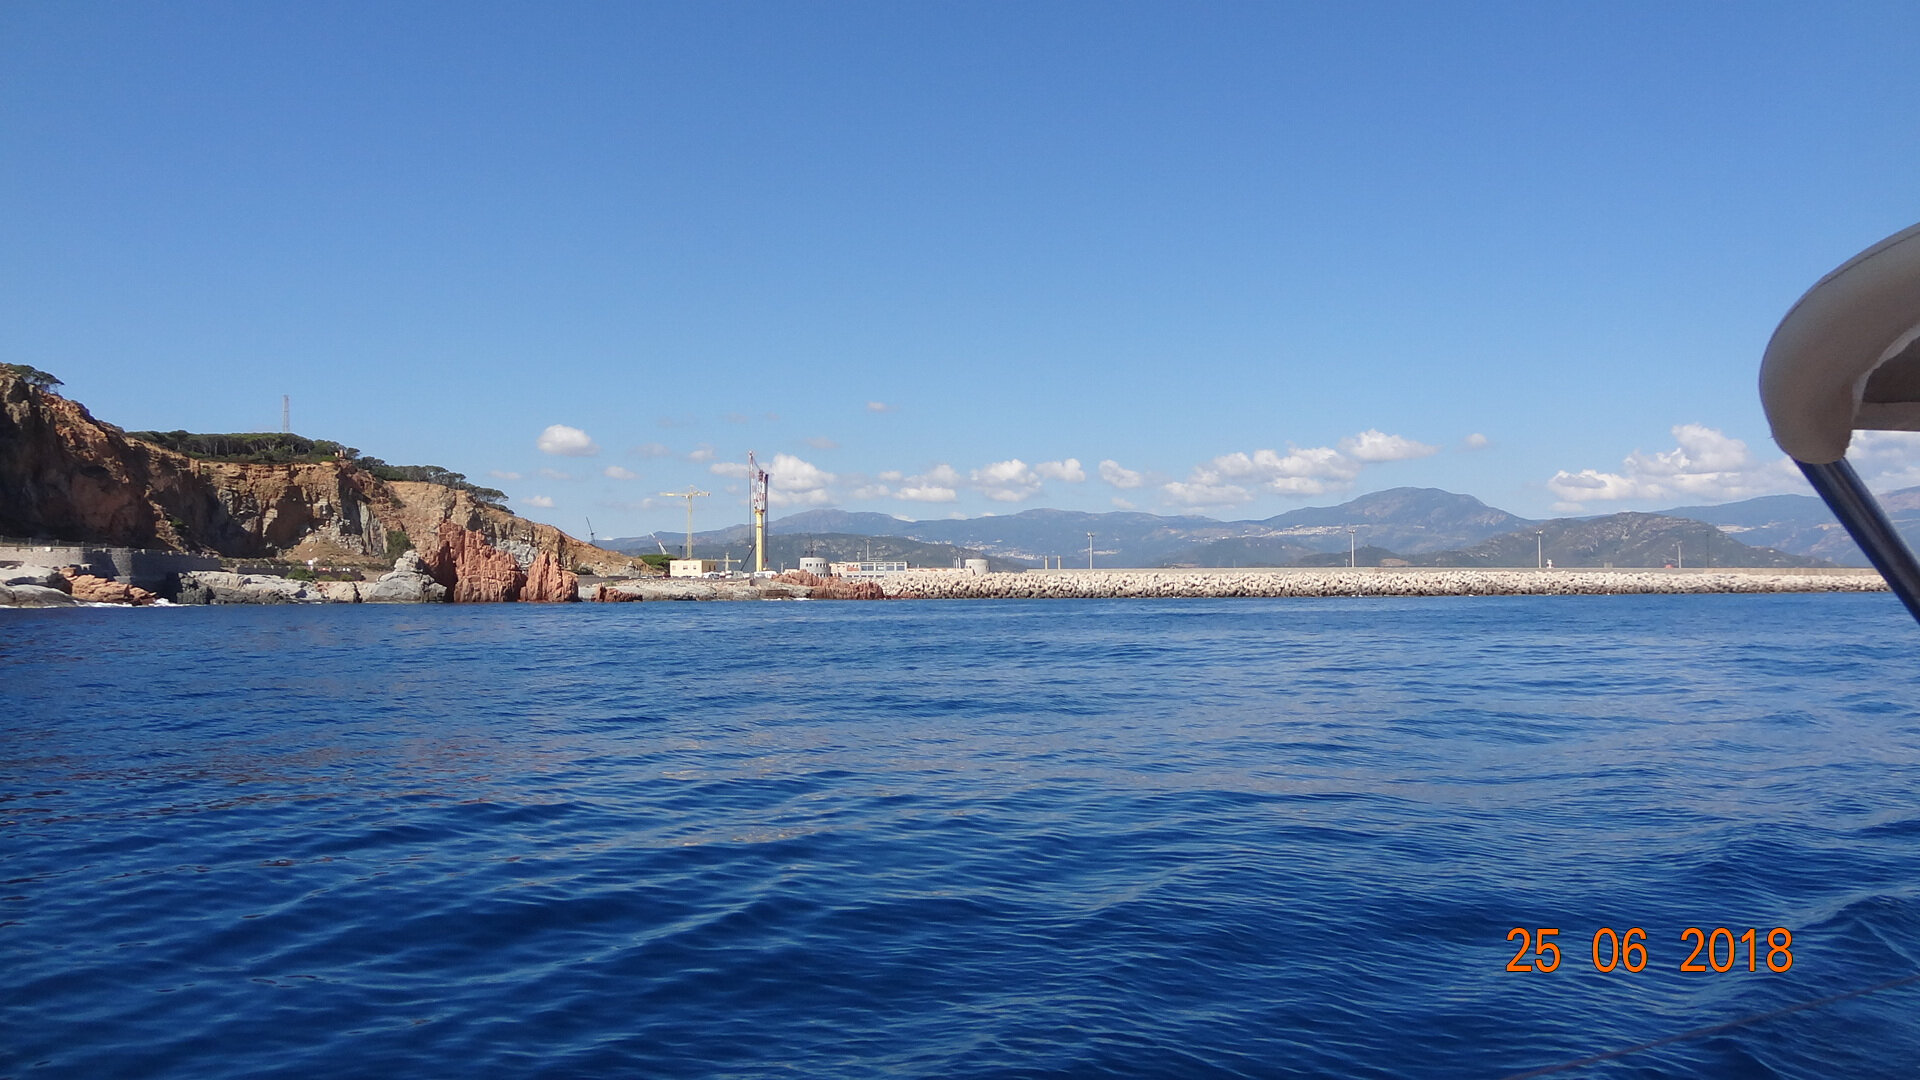 Lundi 25 mardi 26 Traversée Arbatax Capo San Vito 176 milles